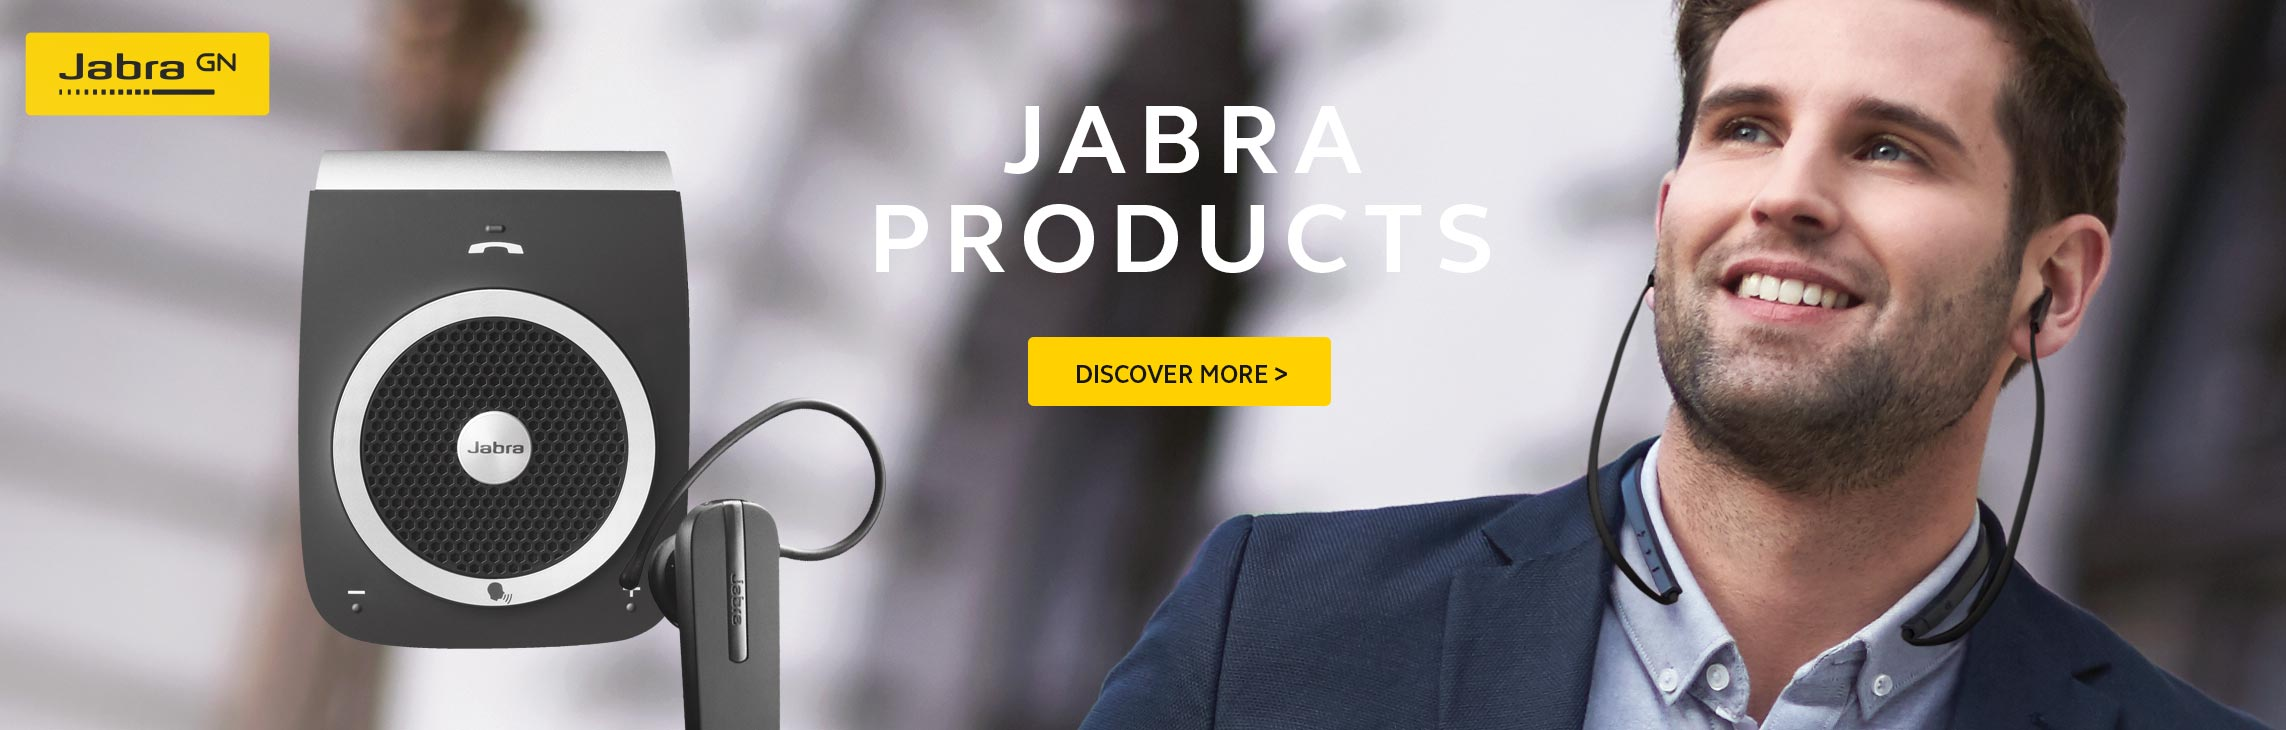 Jabra Products